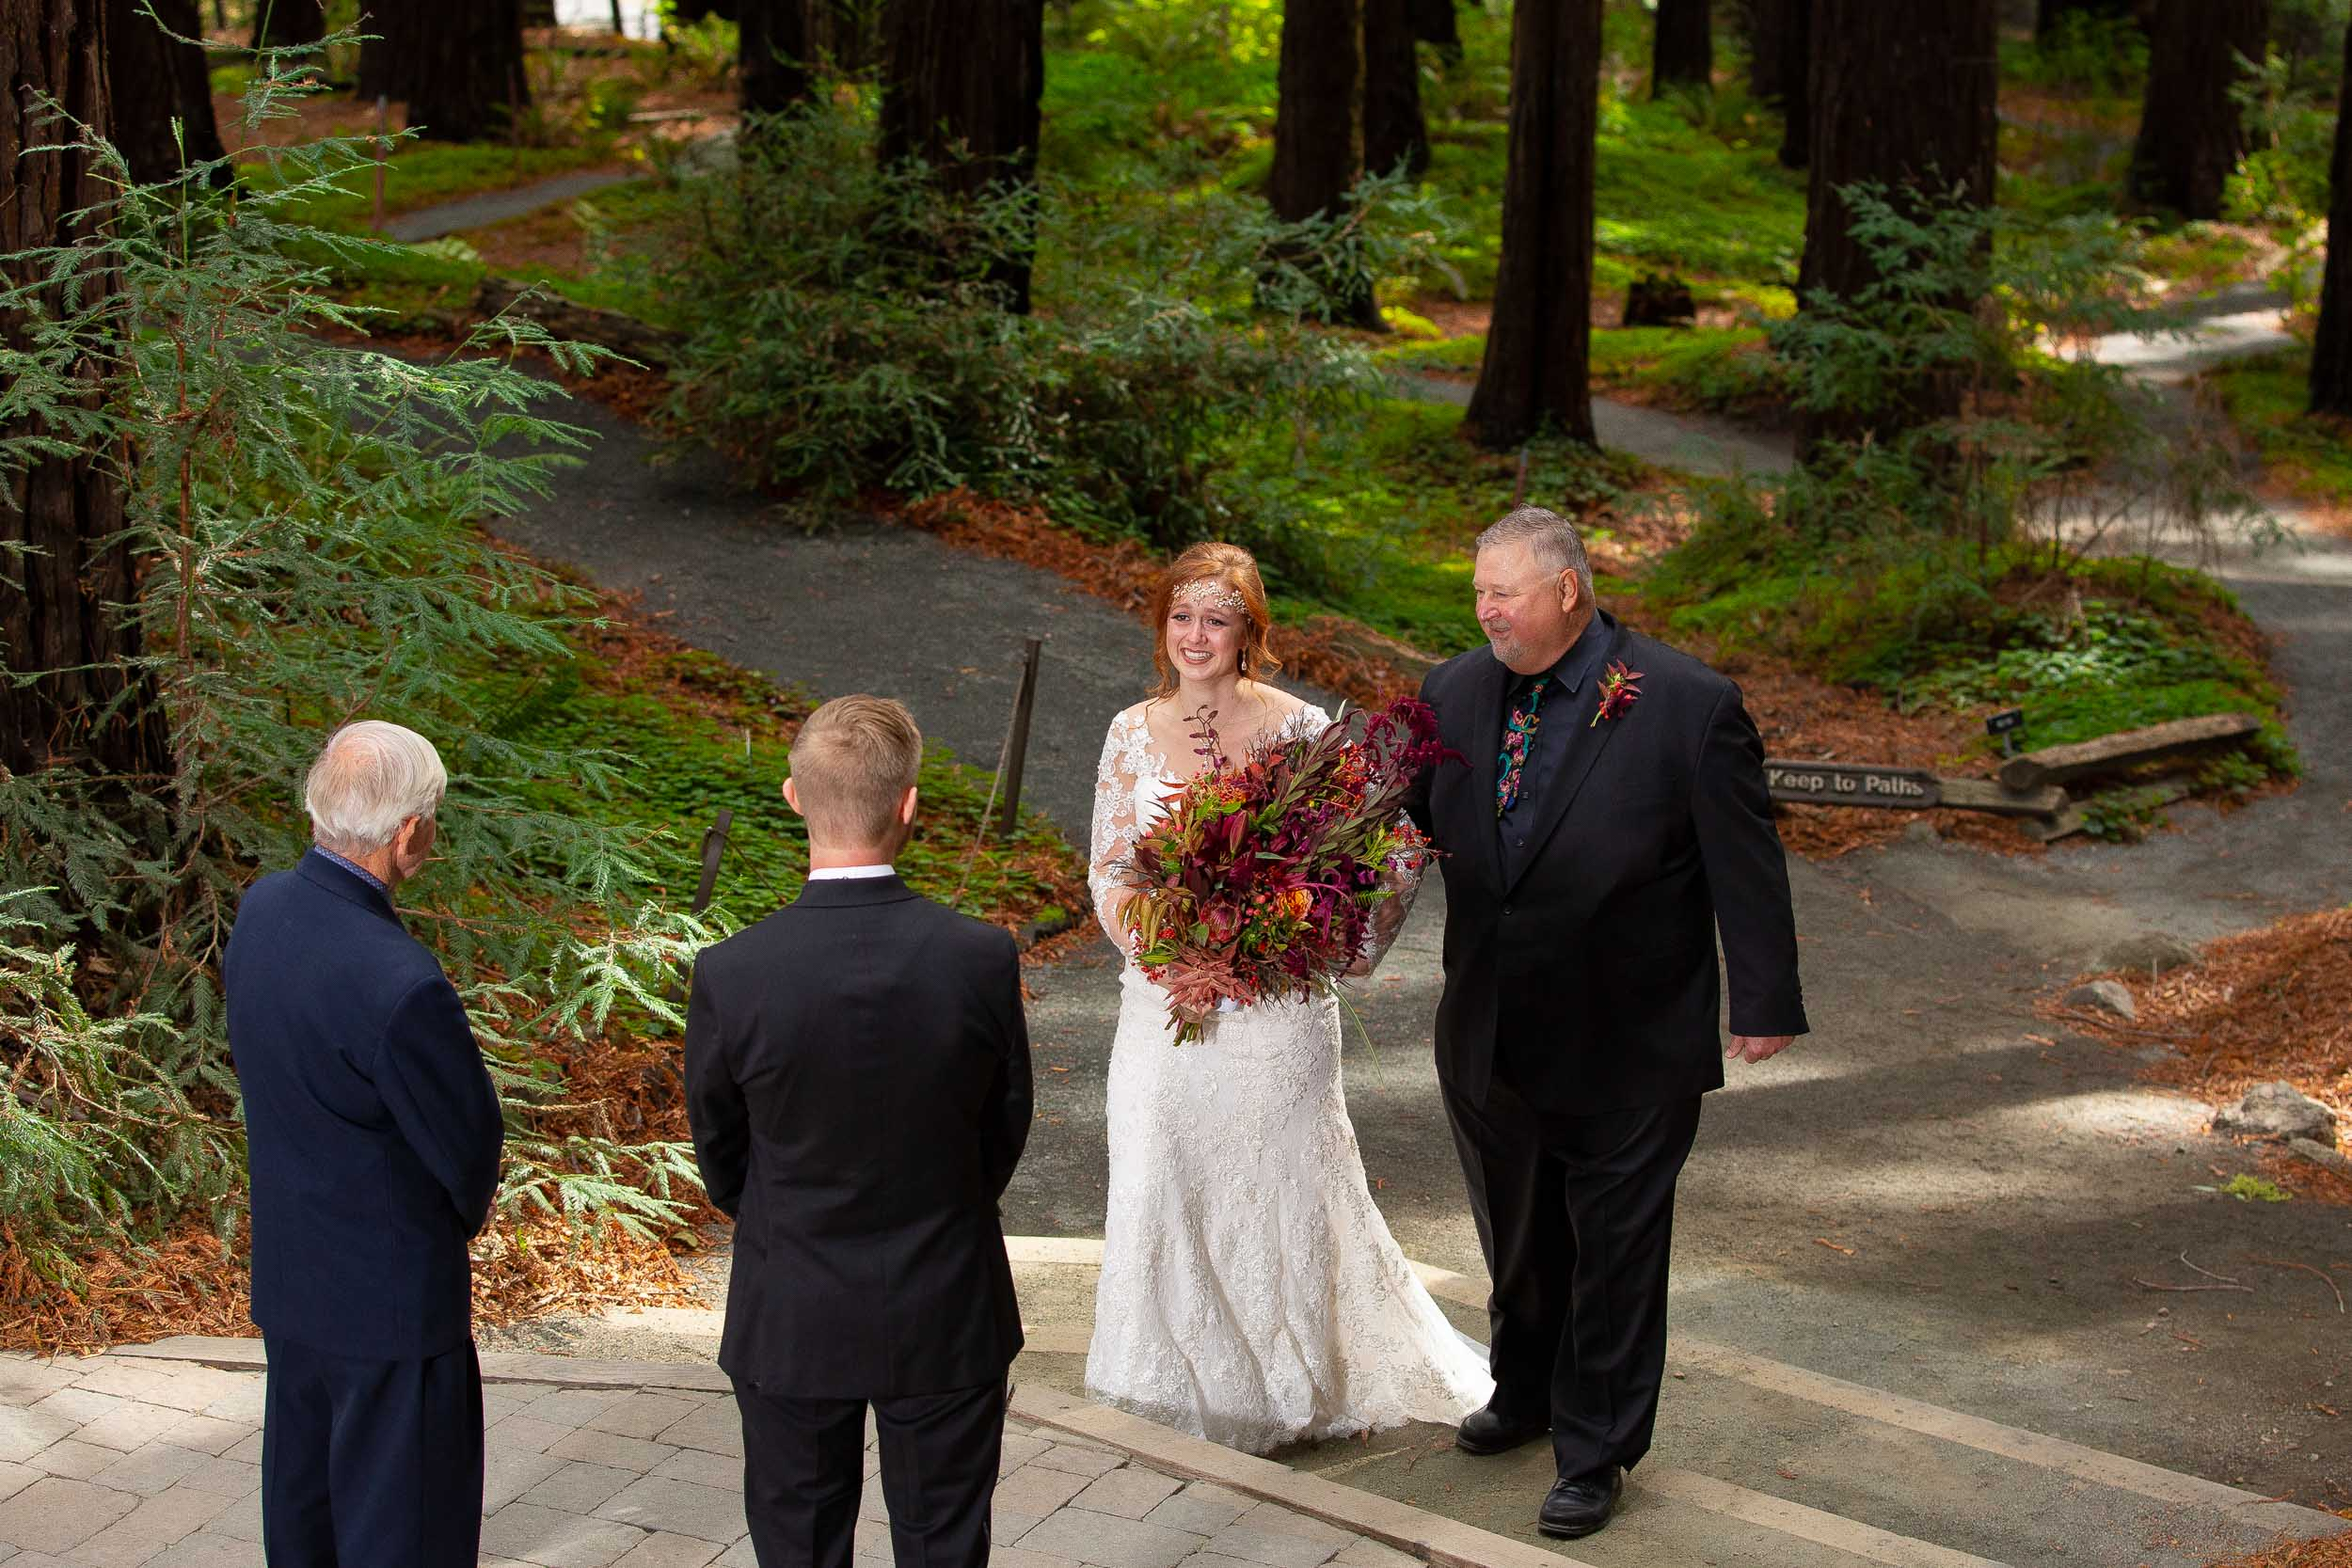 Berkeley Botanical Garden Wedding Ceremony in the Redwood Grove Ceremony and SF Bay Wedding Cruise Reception-30.jpg